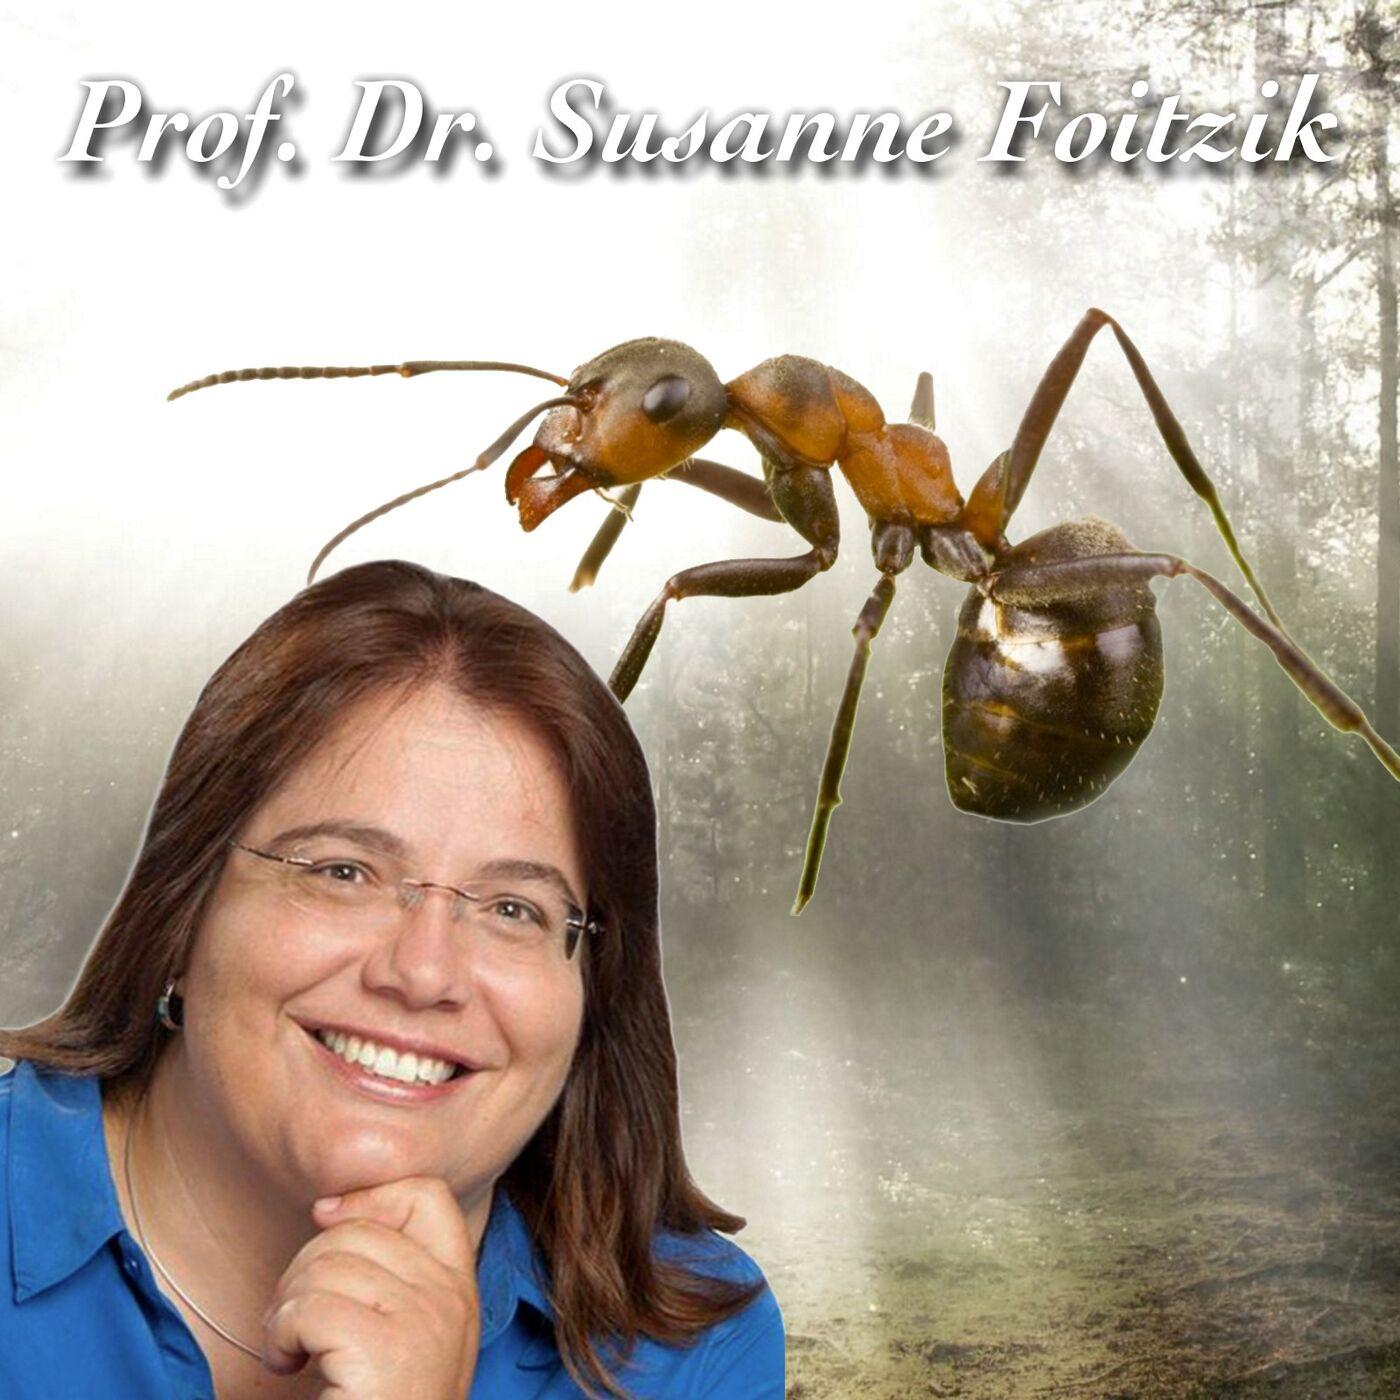 Sklavenhalter Ameise - Prof. Dr. Susanne Foitzik